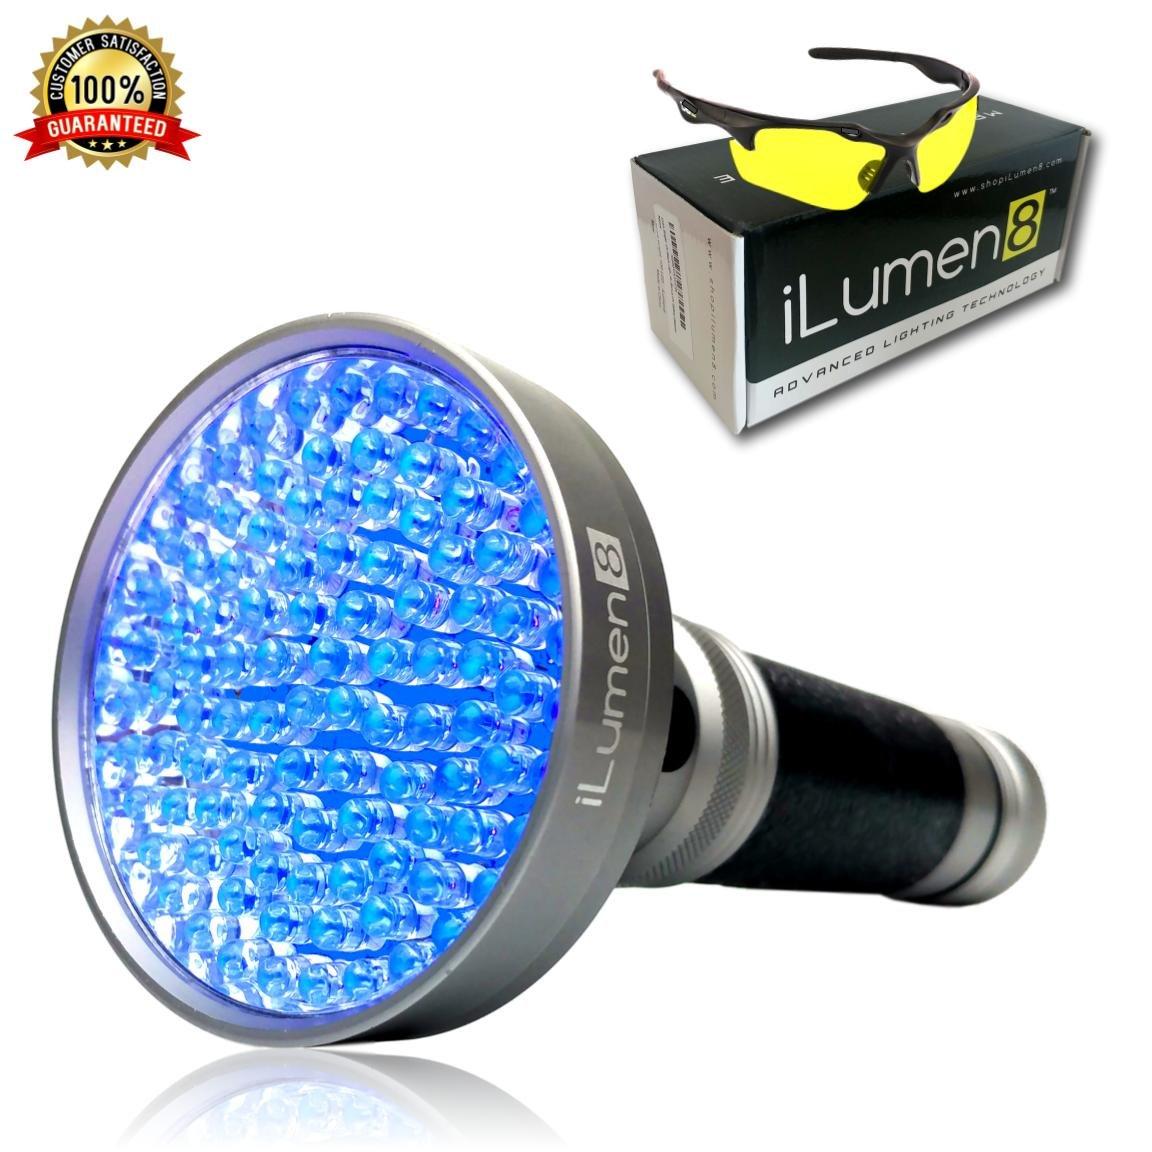 iLumen8 UV Black Light Flashlight Ultimate Pet Pee Urine Finder- 100 LED (Super Hi-Flux) Detect Hidden Hotel & Household Stains, Dog cat Odors, Scorpions, leaks. Includes UV Safety Glasses